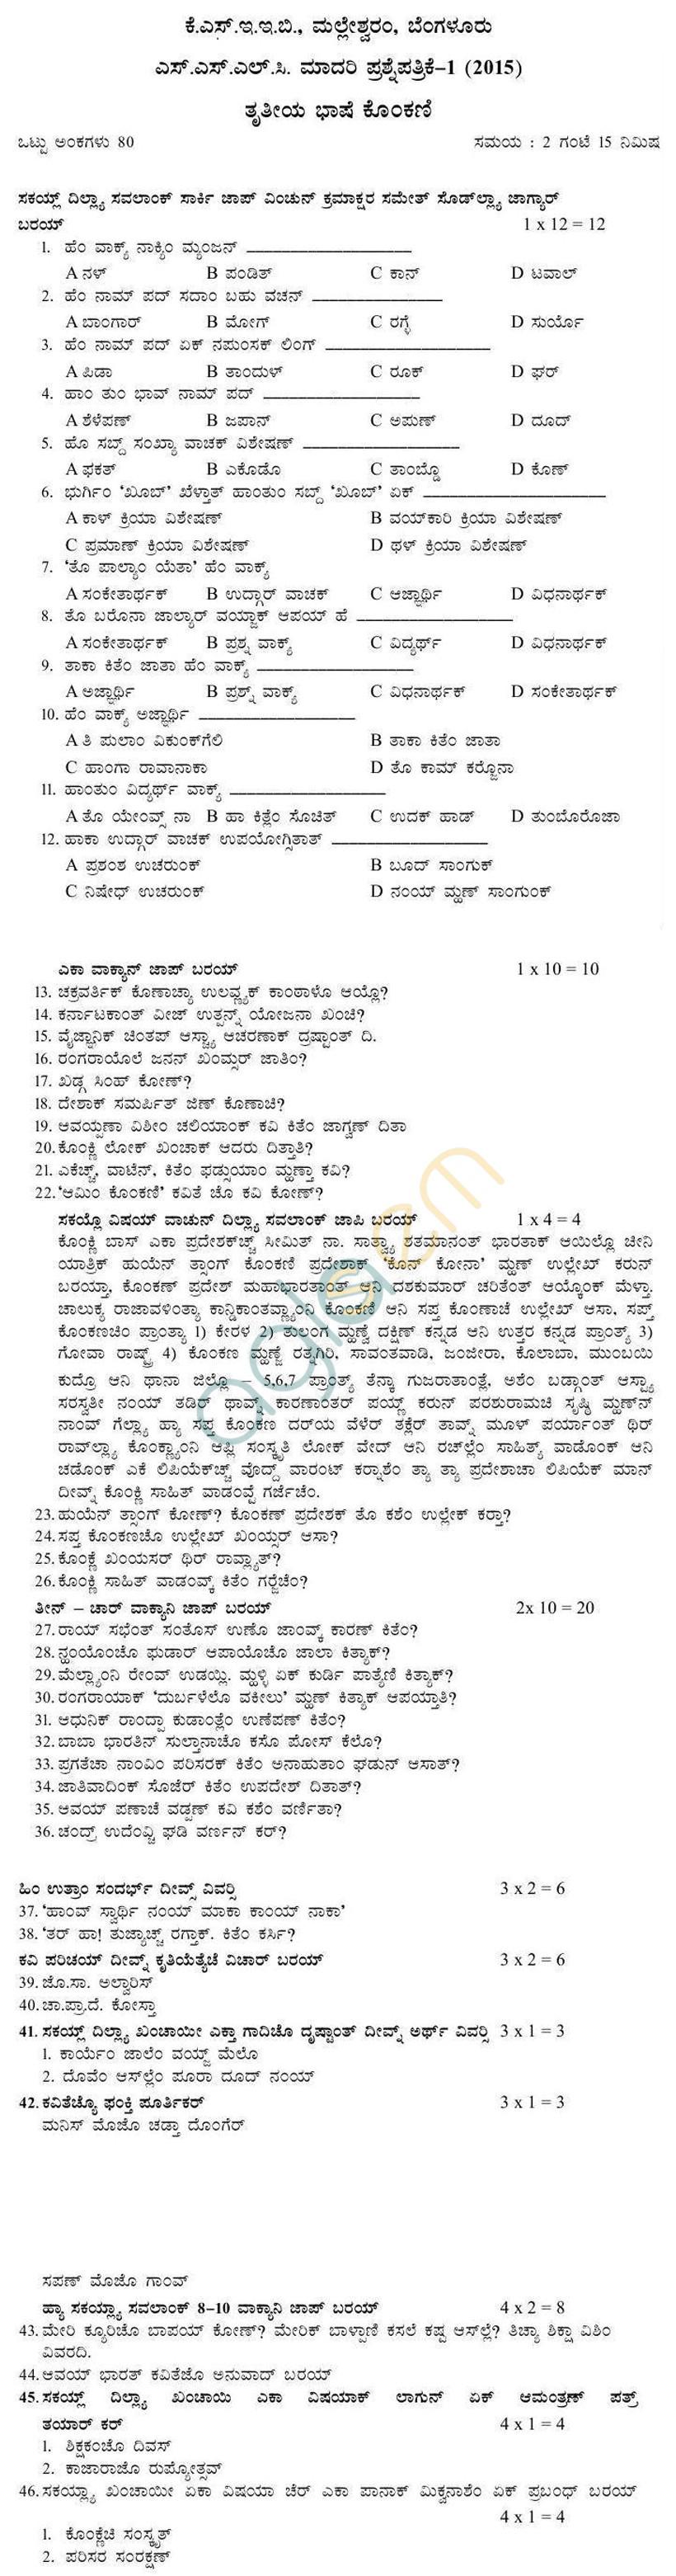 Karnataka Board SSLC Model Question Papers 2015 forKonkani (III)